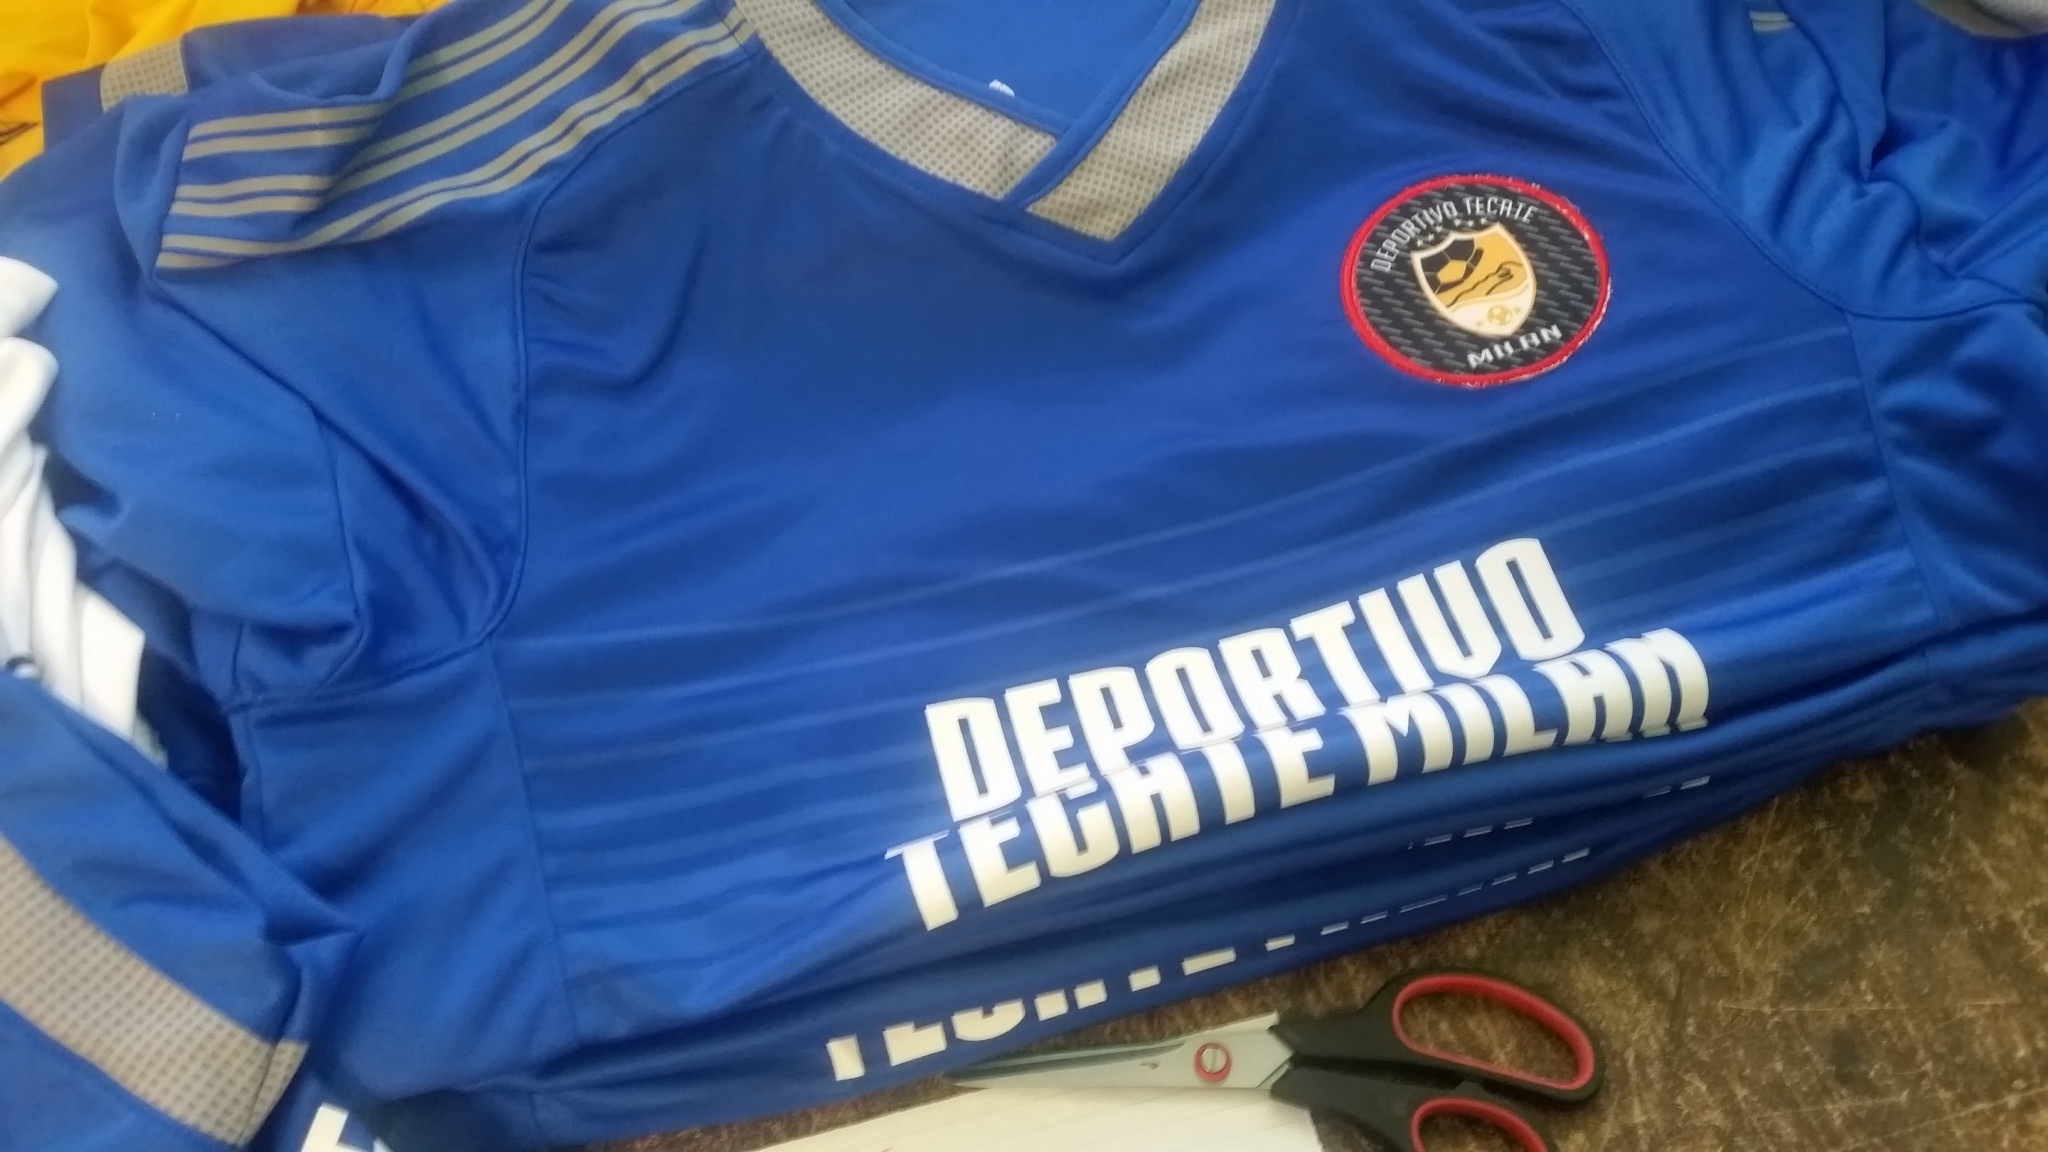 39a904e6c417c MEDIDAS DE LAS PLAYERAS DE FÚTBOL SOCCER - Comercial Deportiva ...